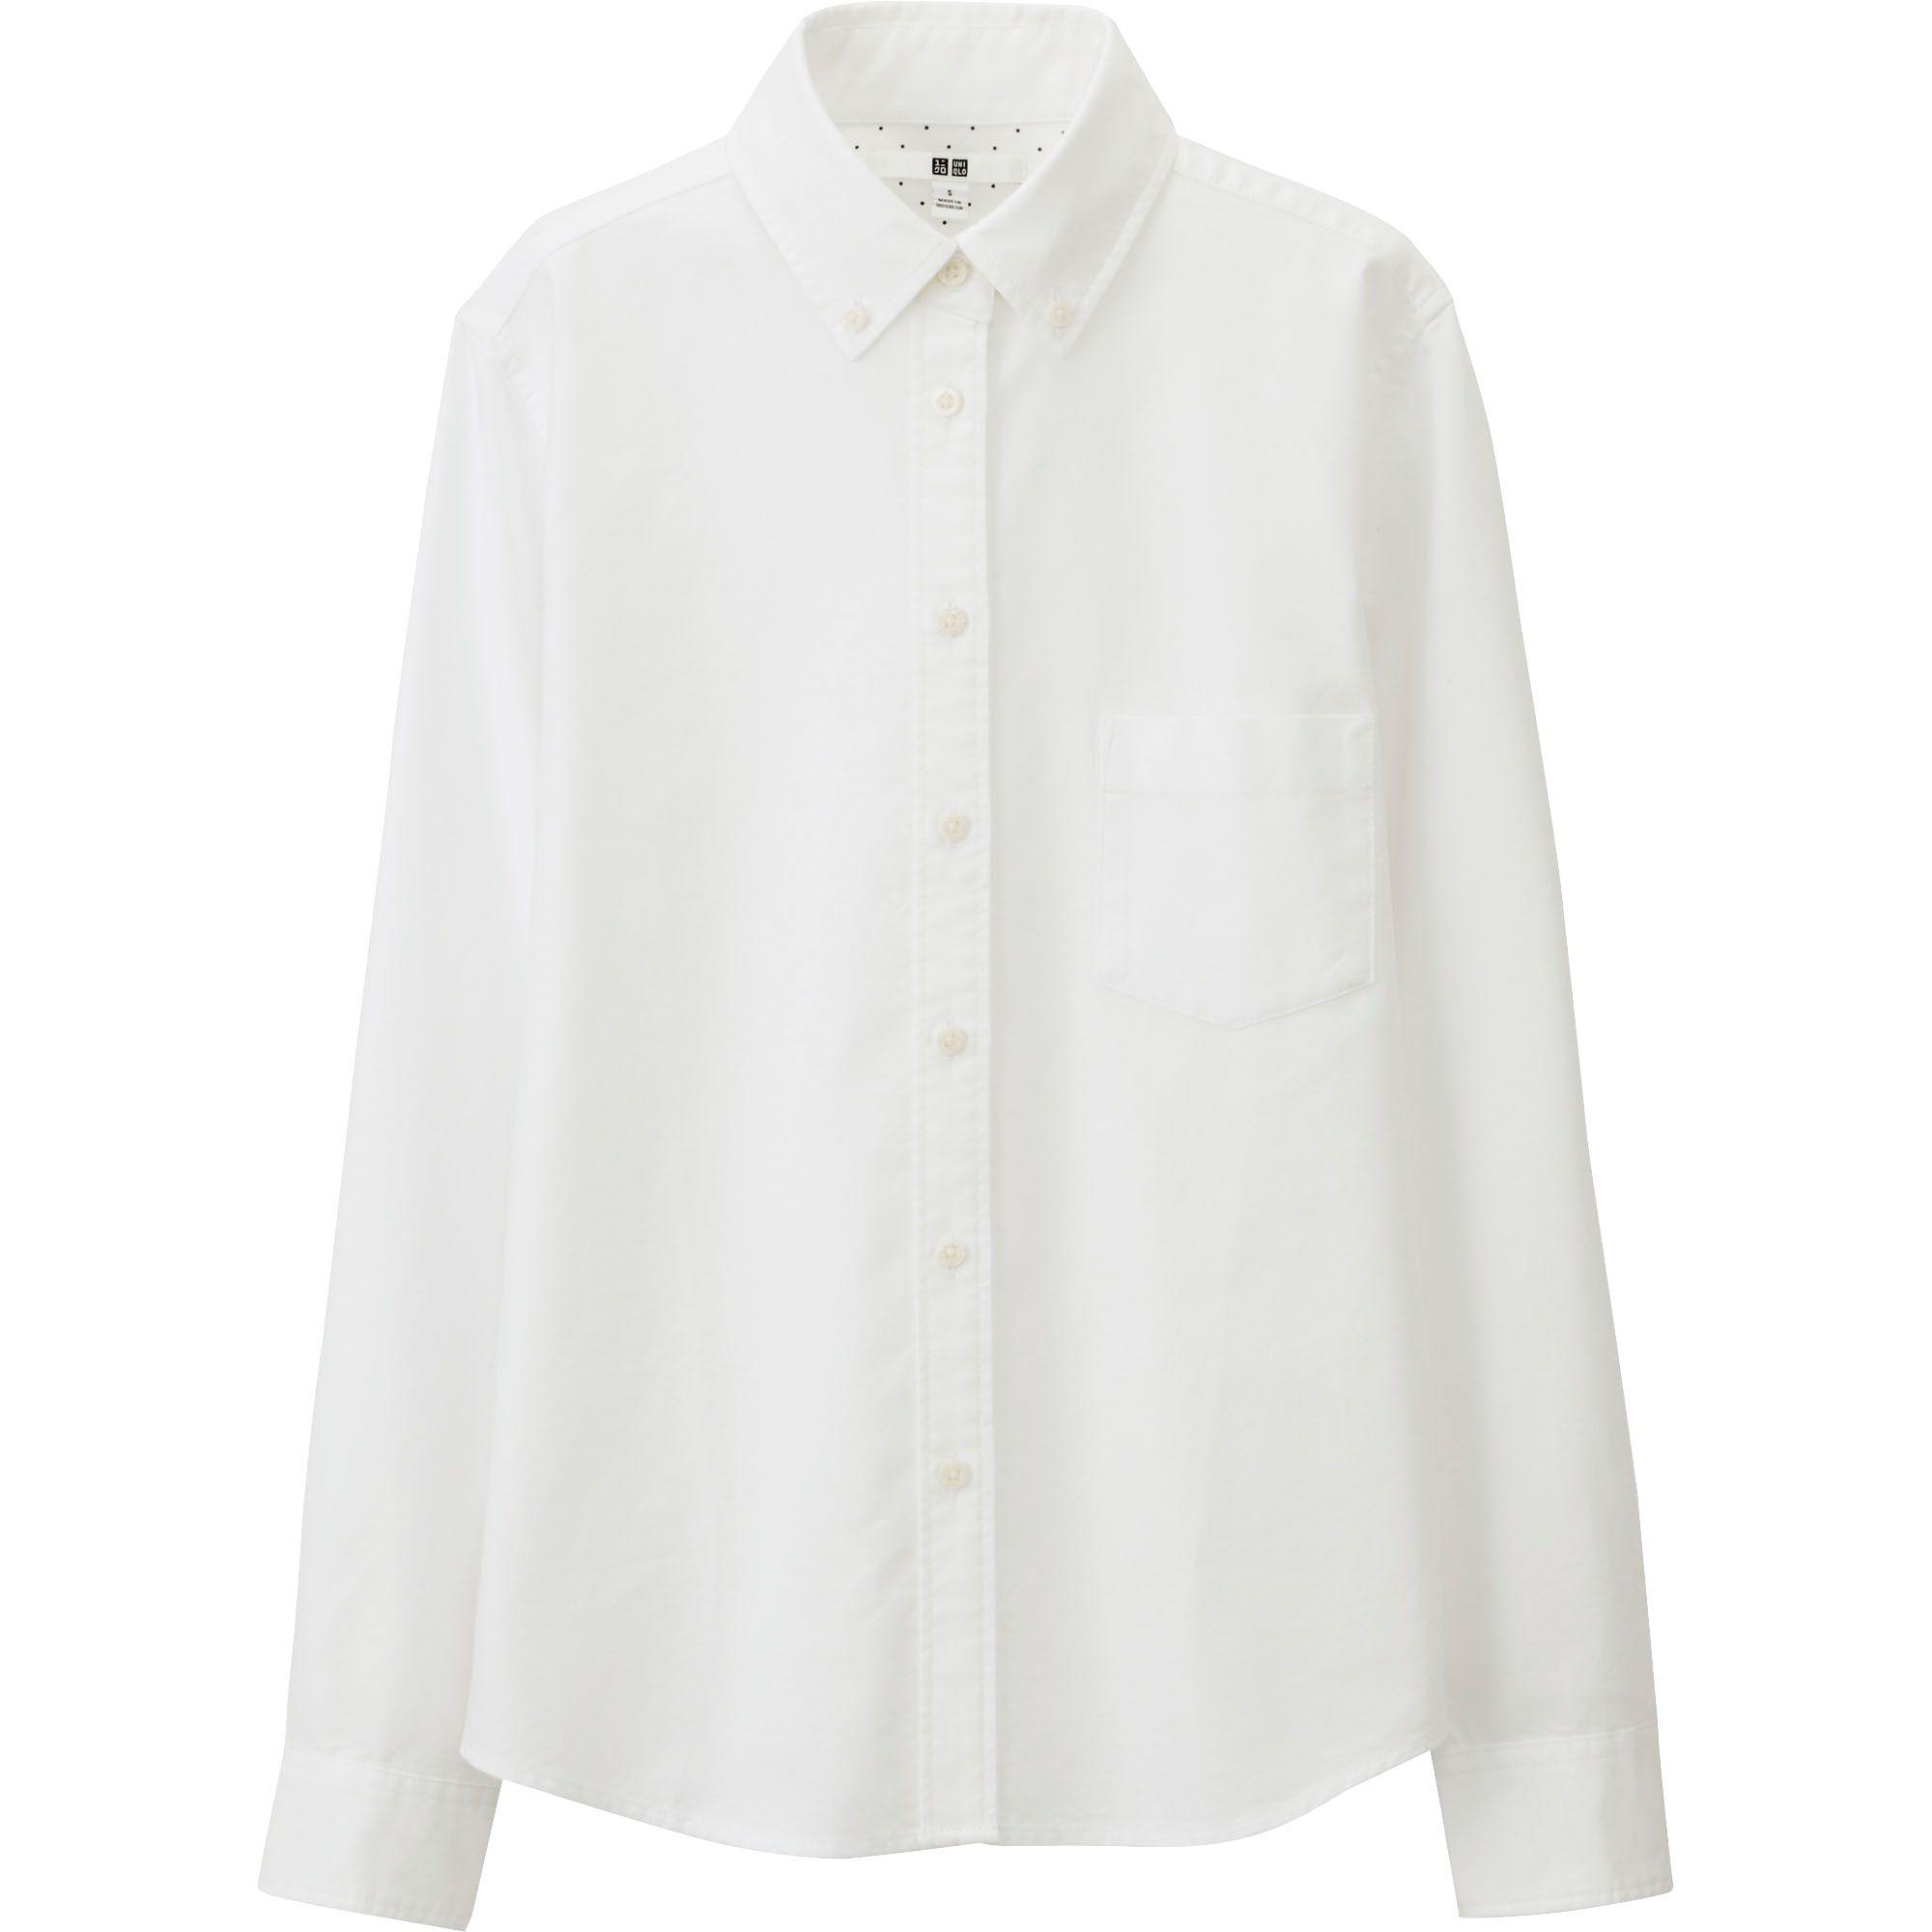 Uniqlo White Women Oxford Long Sleeve Shirt Lyst